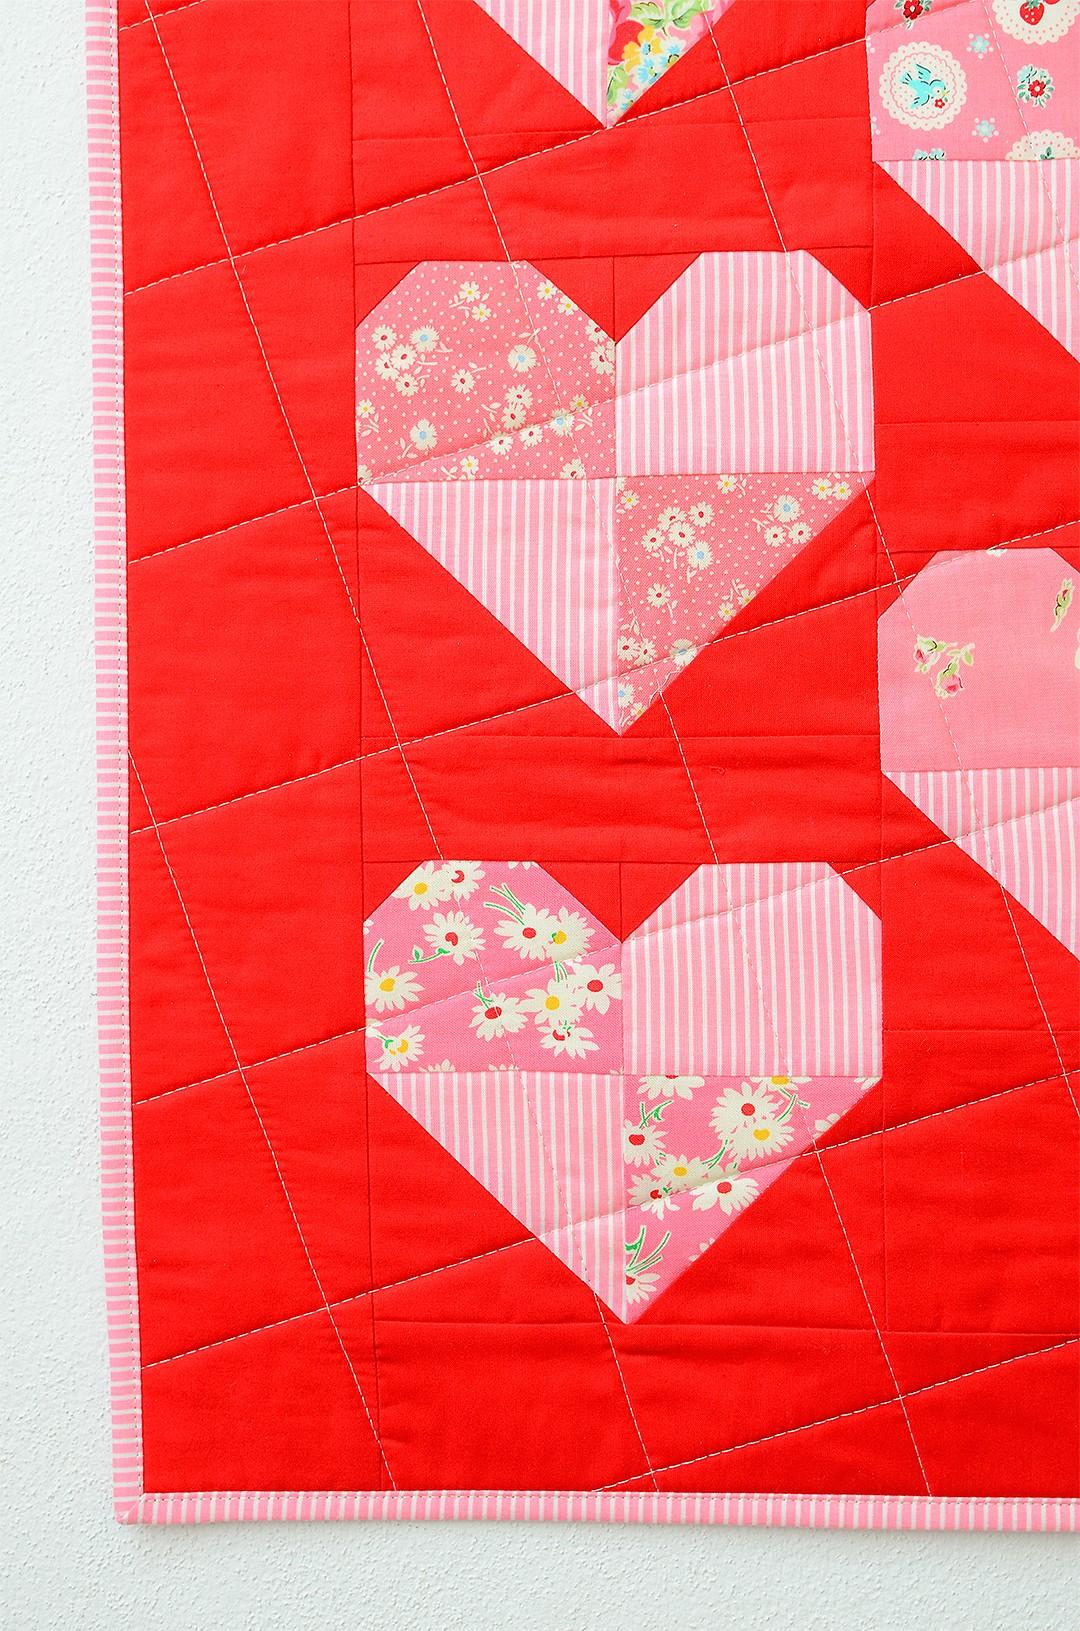 Harlequin Hearts Mini Quilt - Heart Quilt Pattern